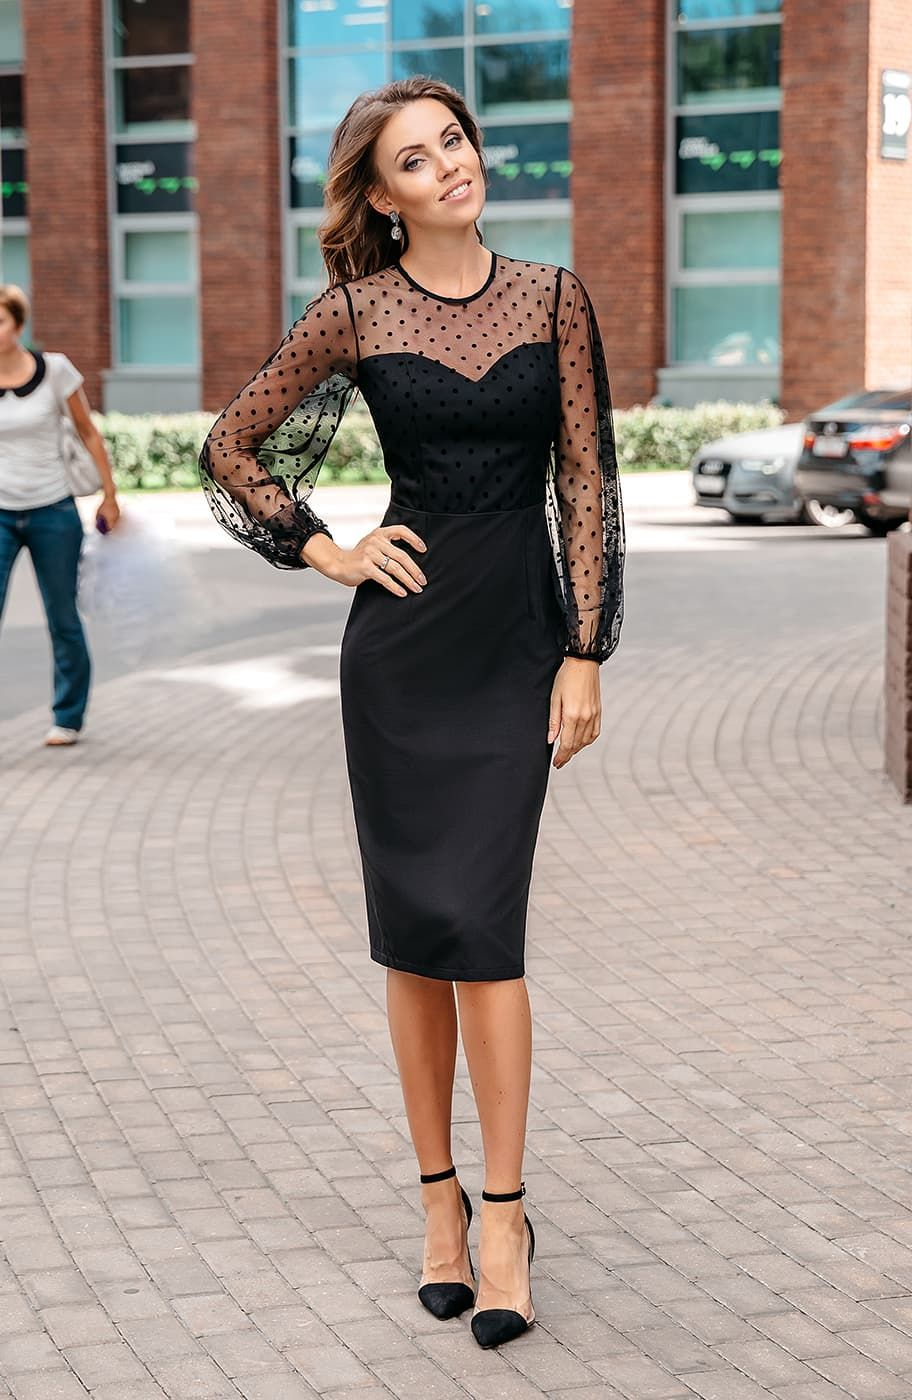 b852c4871fa Платье футляр Donna-Saggia DSP-349-6 от производителя